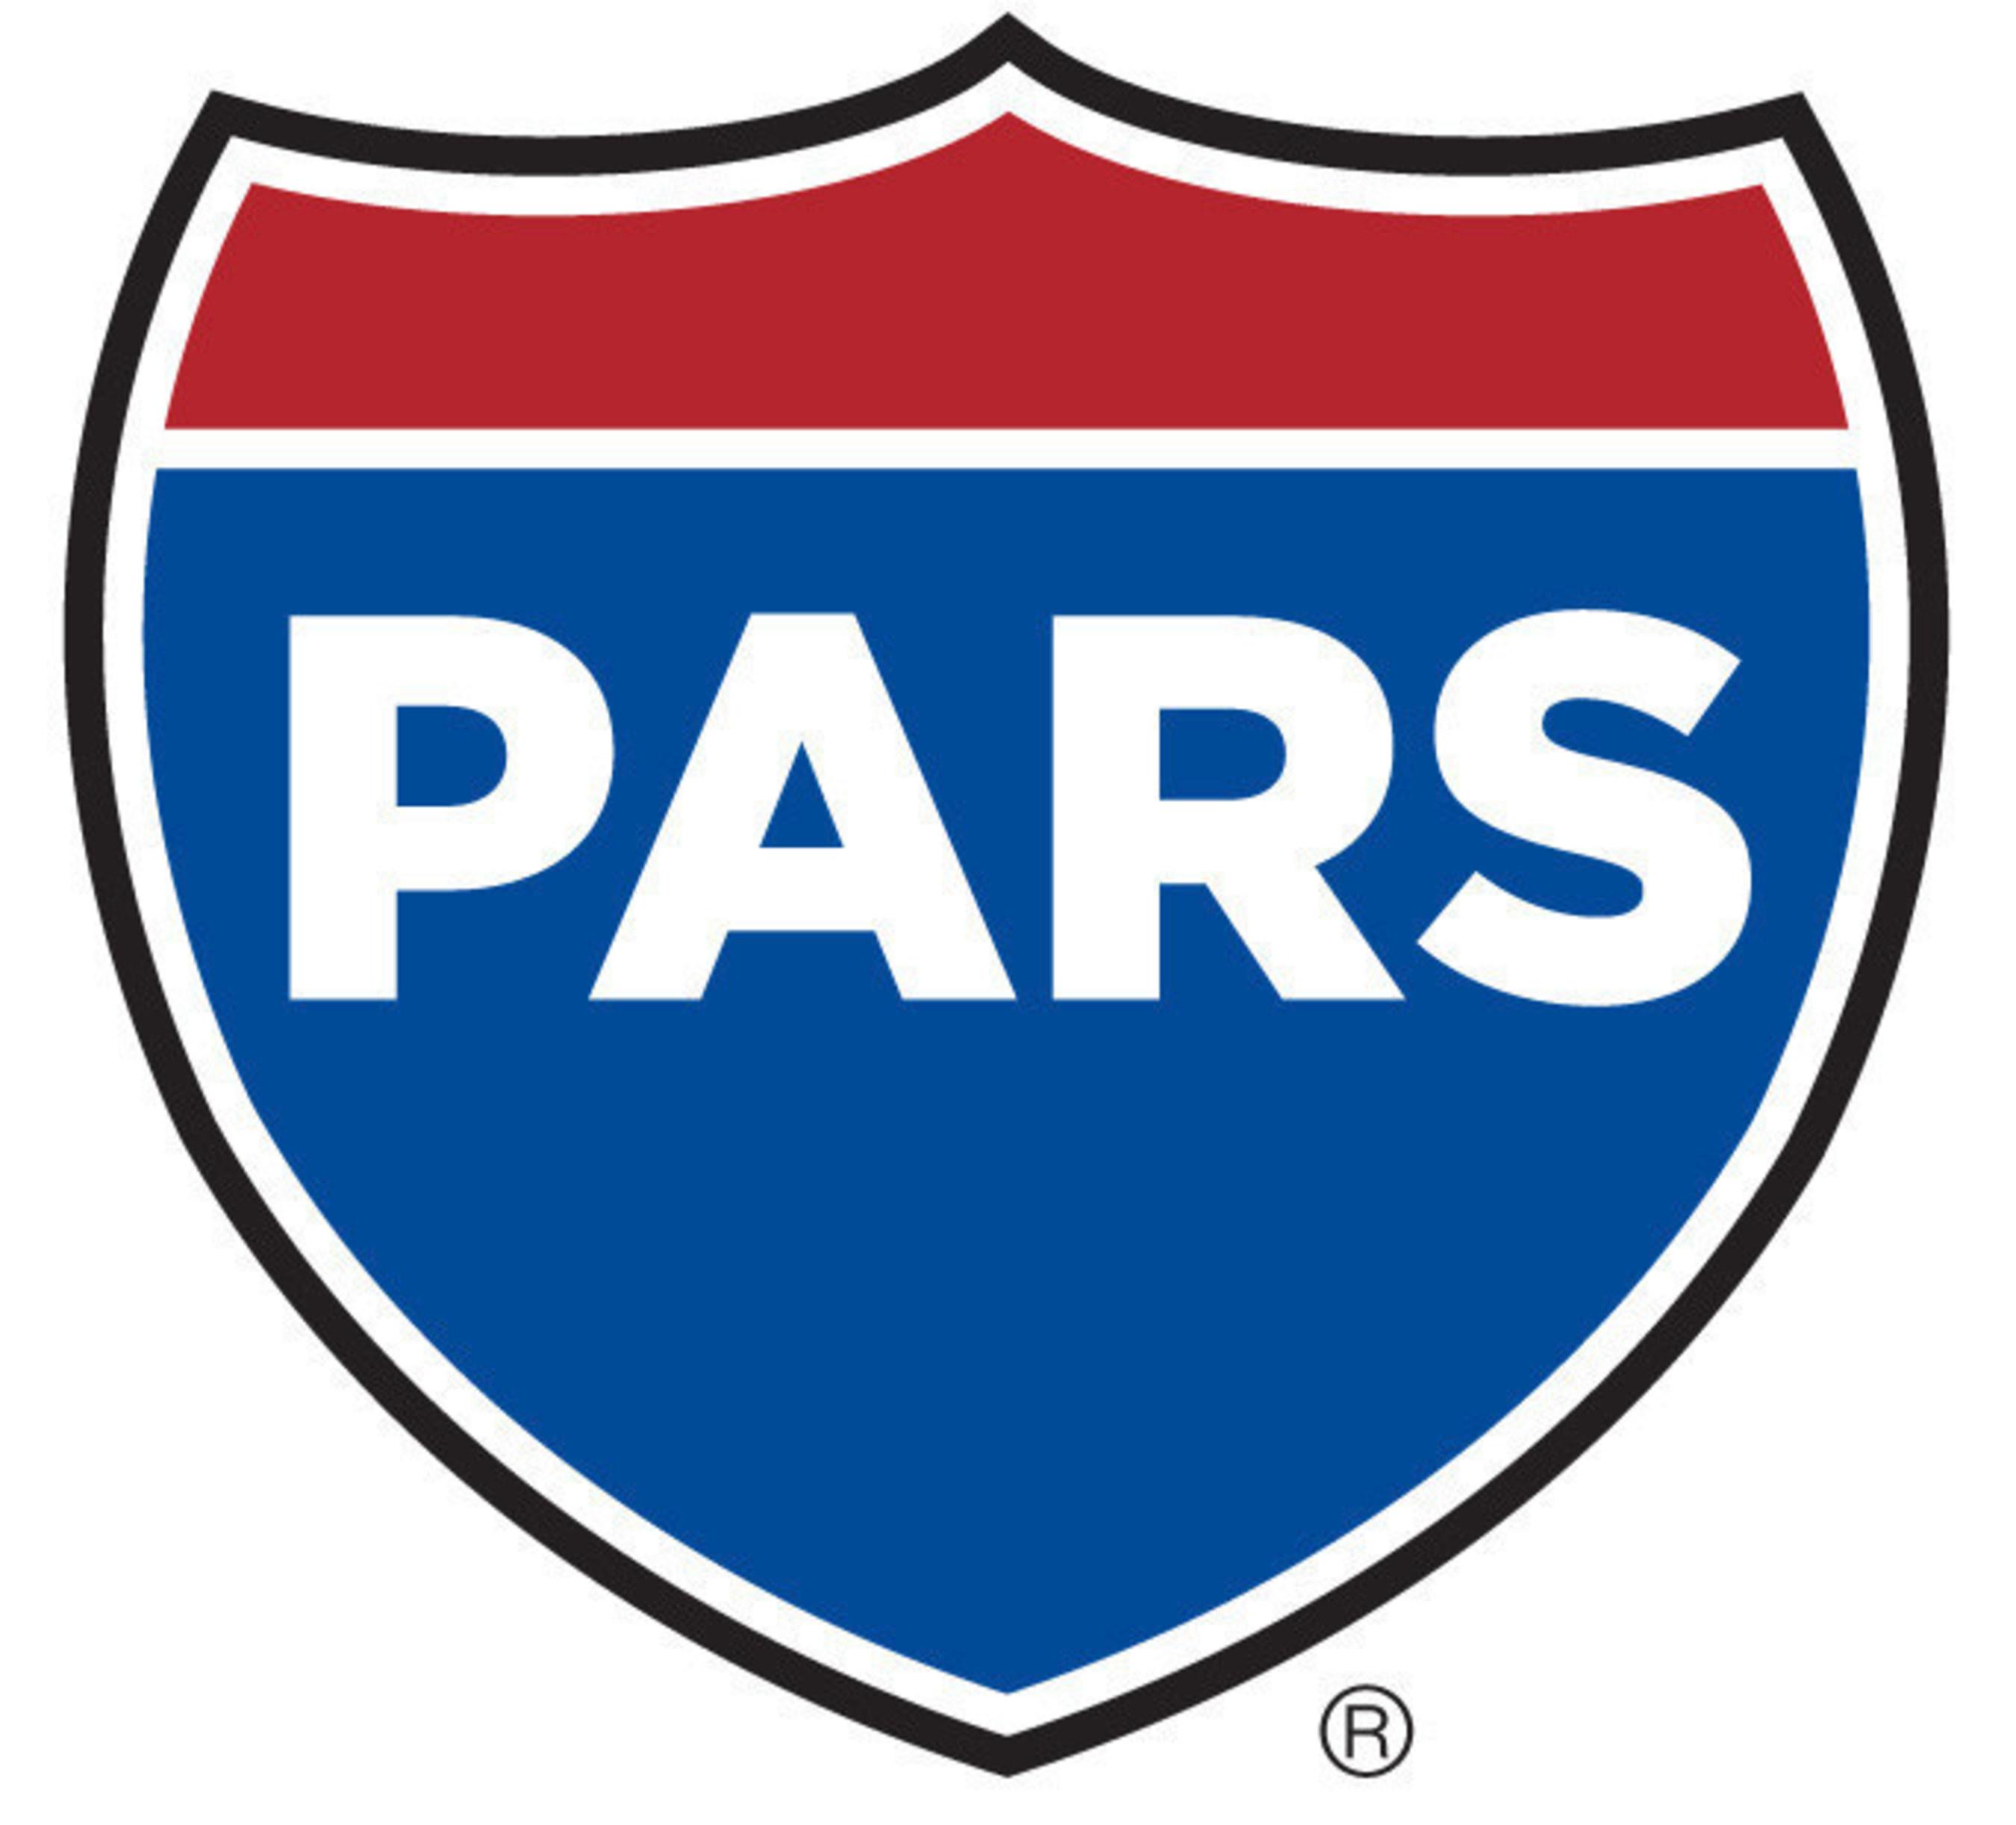 PARS Enhances Digital Presence With New-Look Parsinc.com